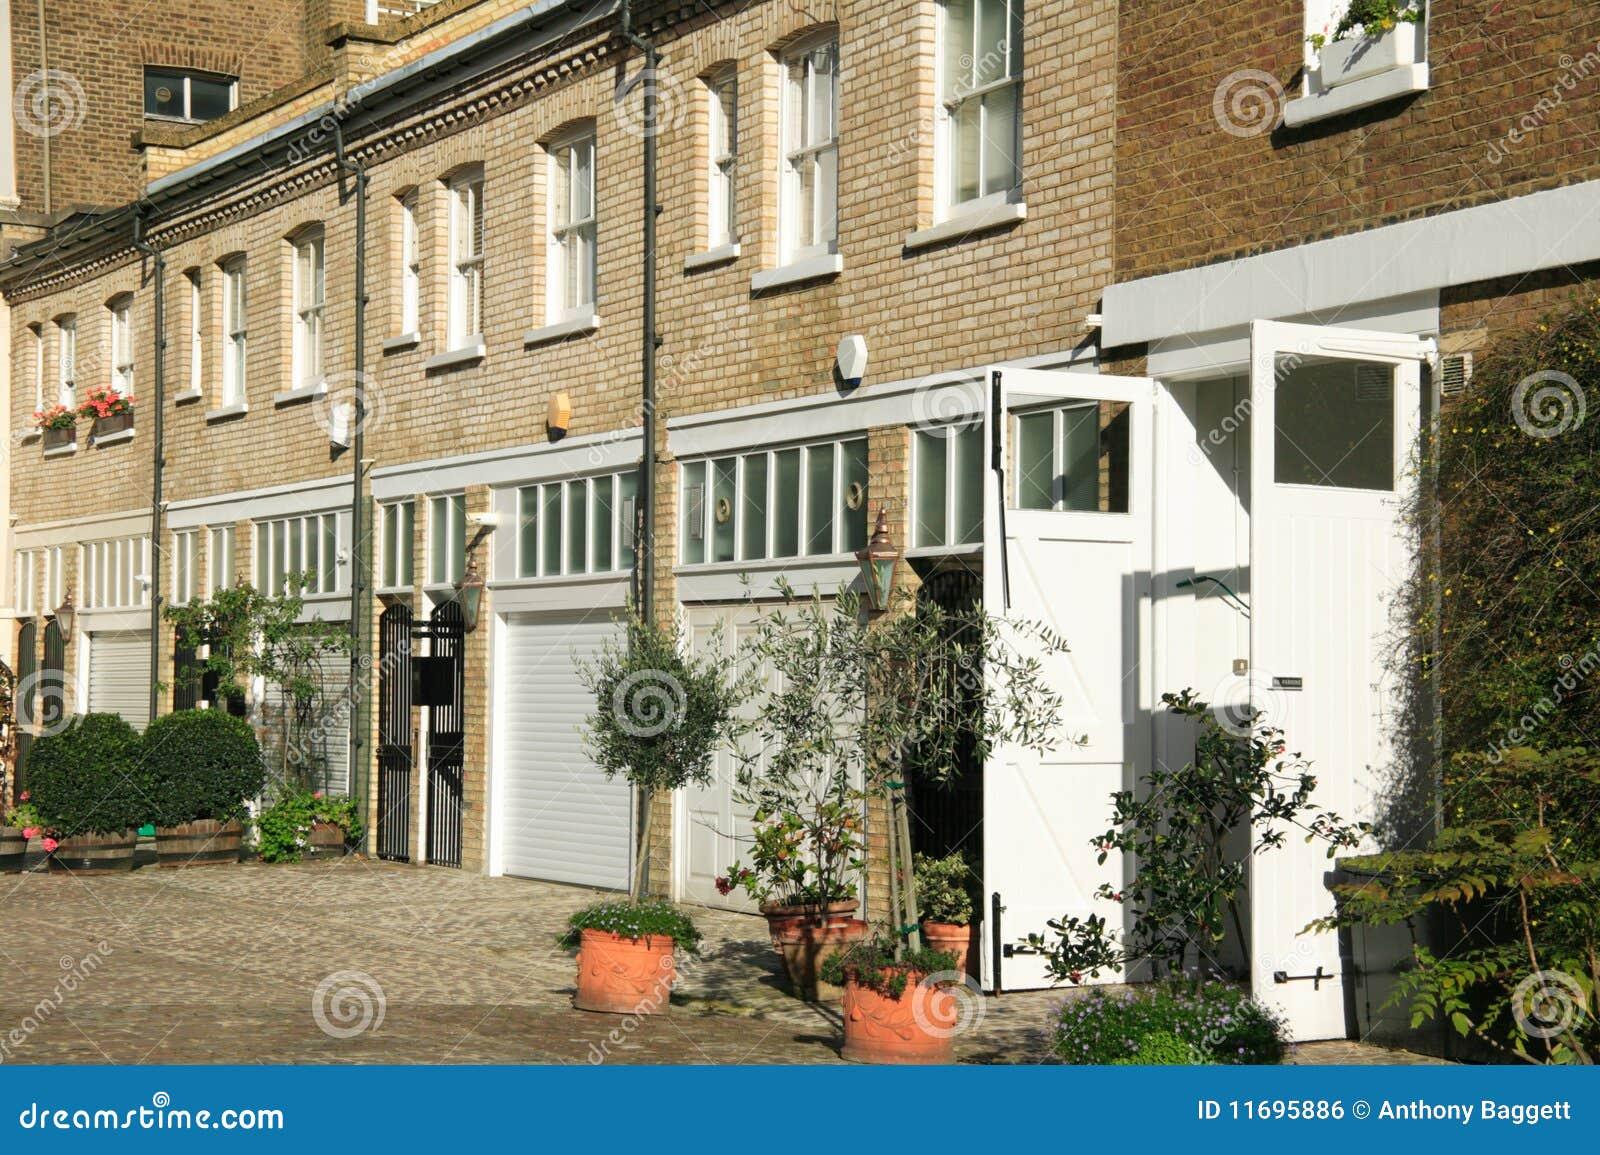 london mews houses royalty free stock image image 11695886. Black Bedroom Furniture Sets. Home Design Ideas